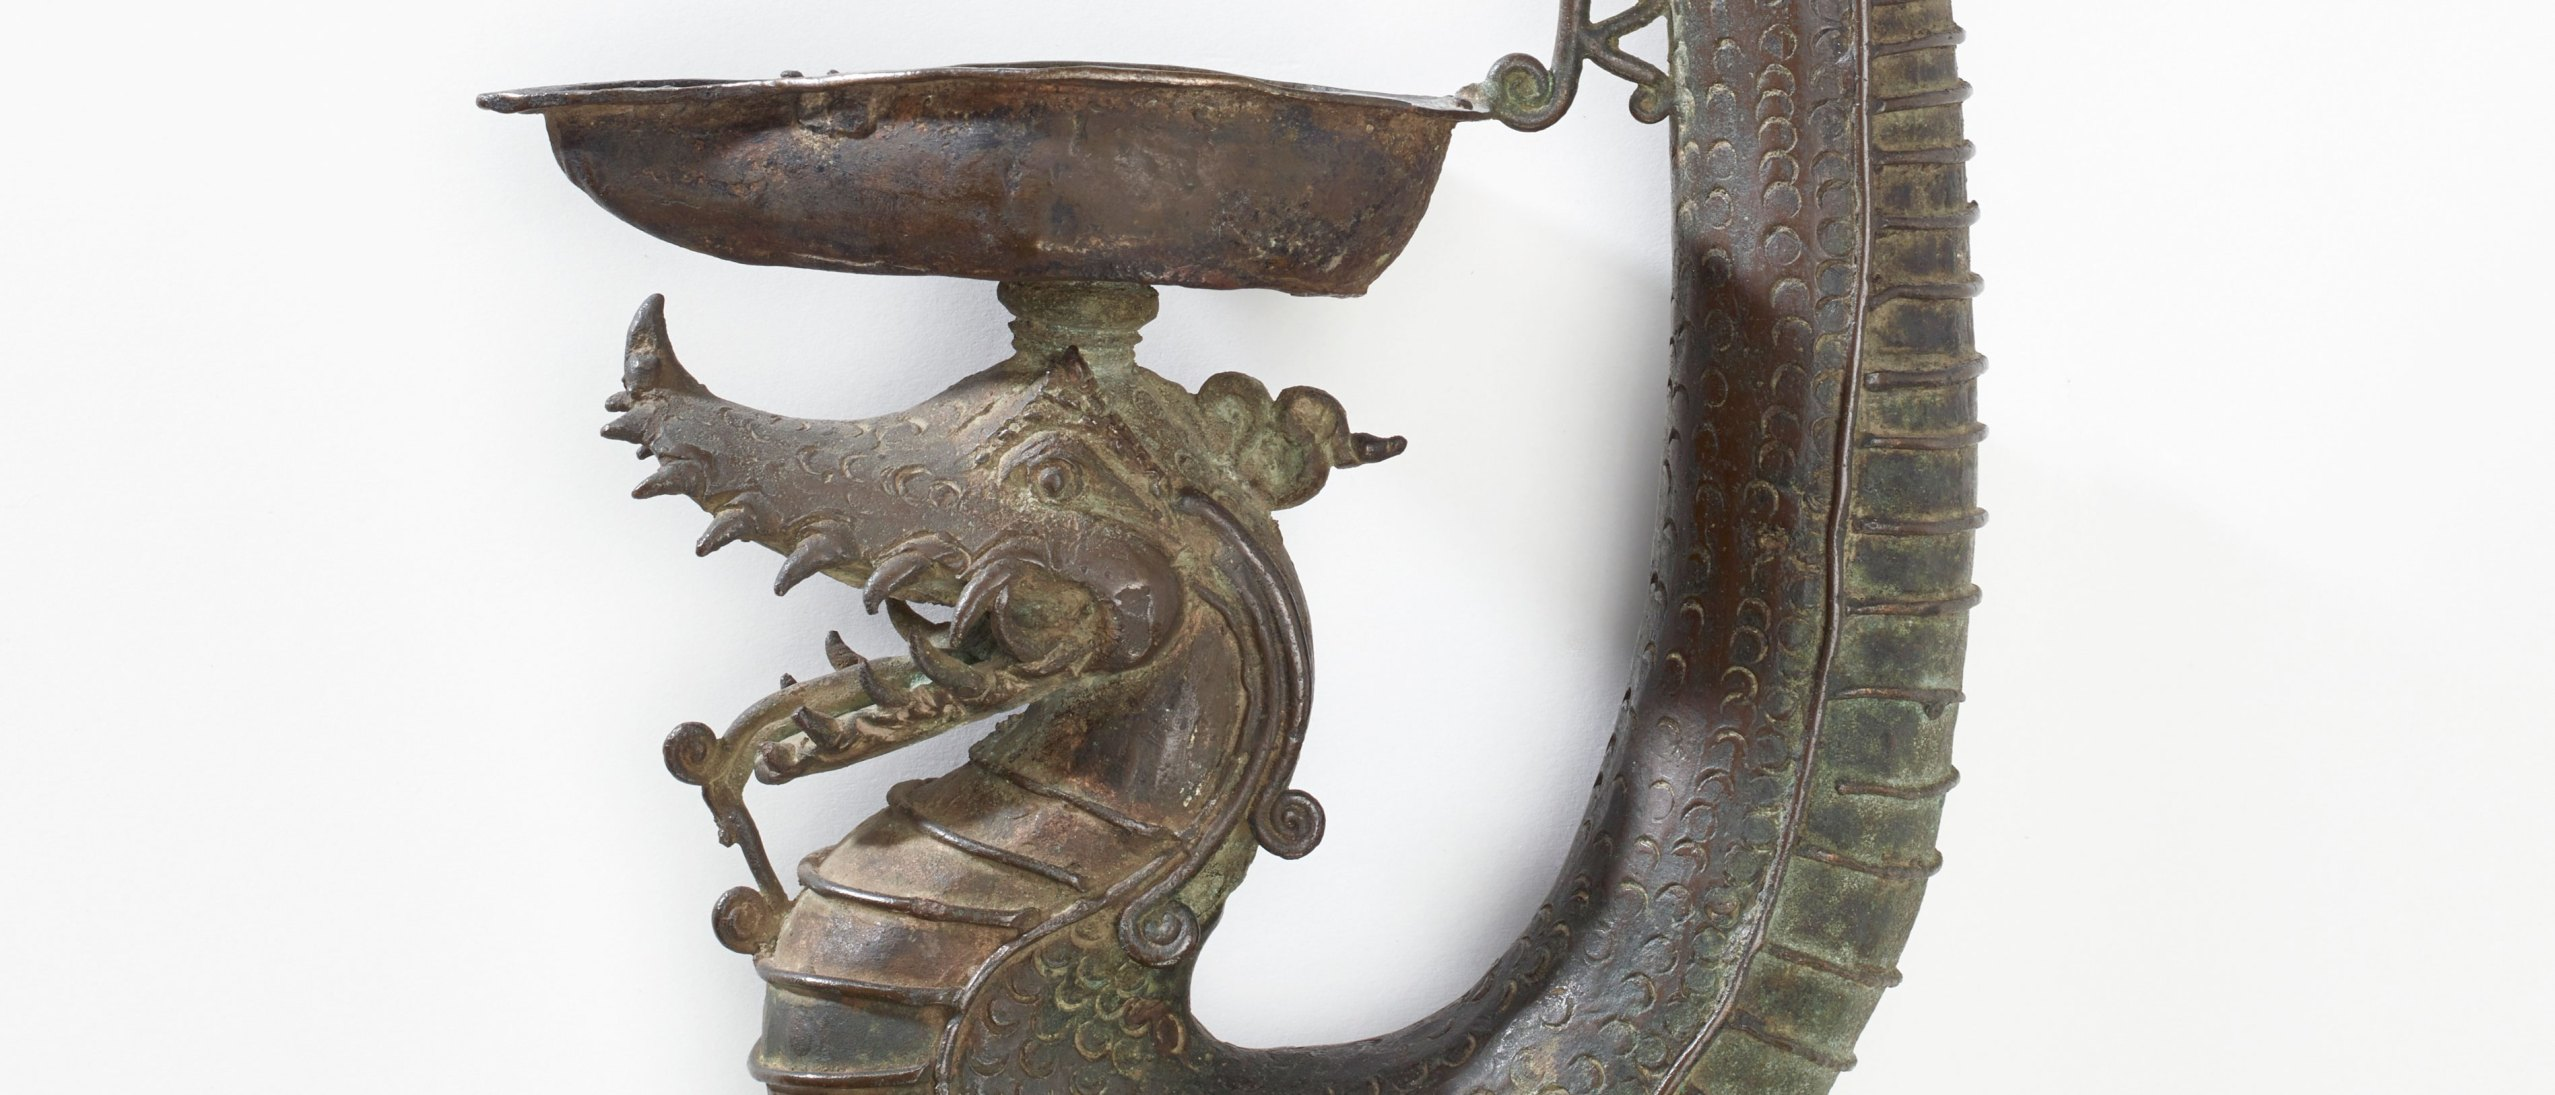 detail from Naga Oil Lamp